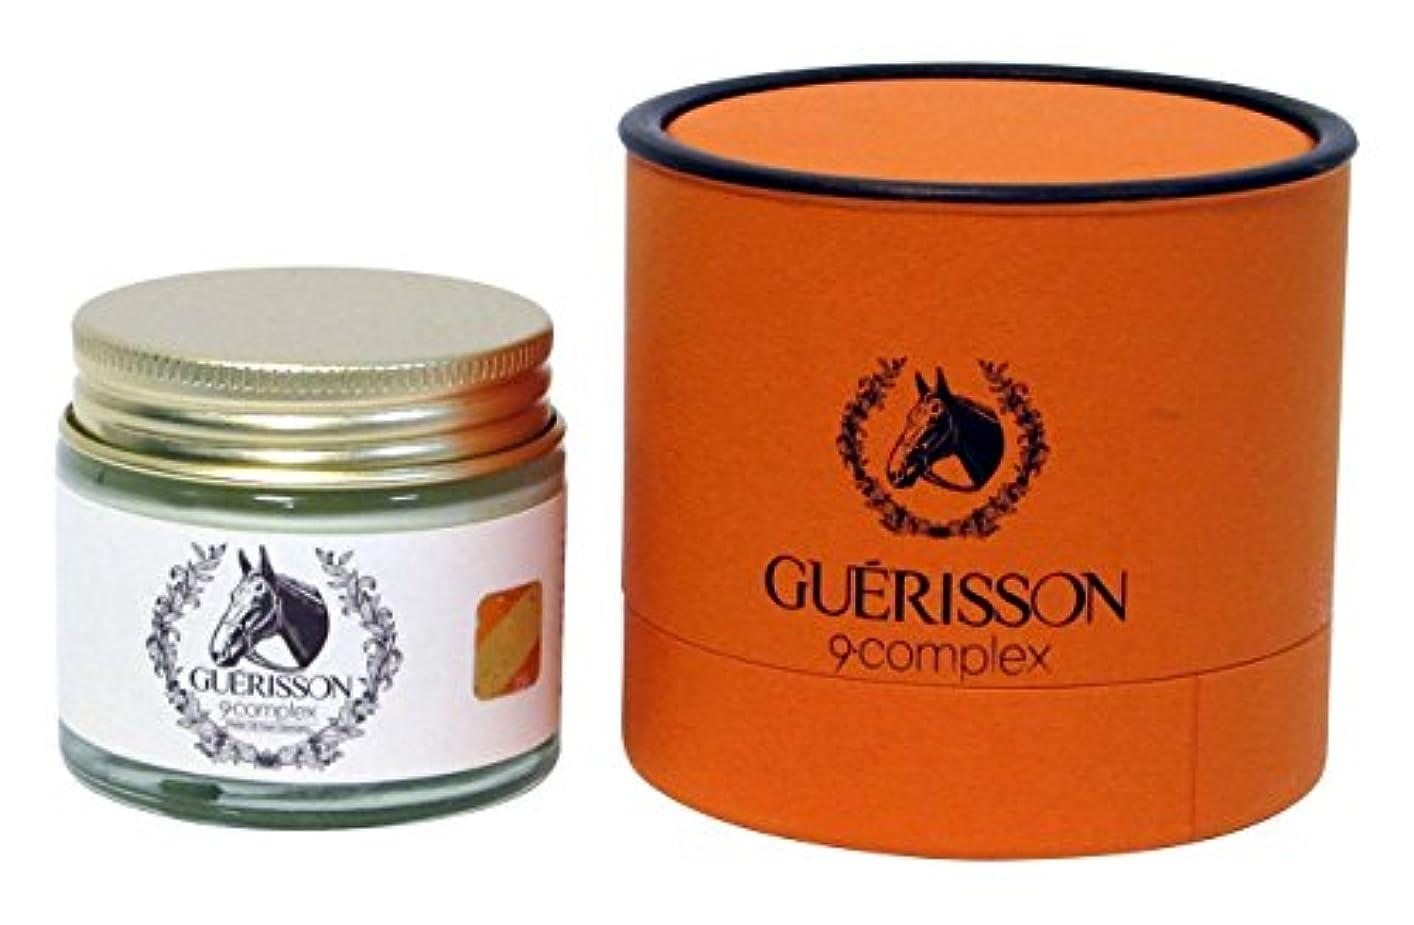 [3EA] GUERISSON ゲリソン 9?complex 馬油クリーム (9 Complex Moisturizing Scar Cream Horse Oil Wrinkle Care) 70g*3 [並行輸入品]